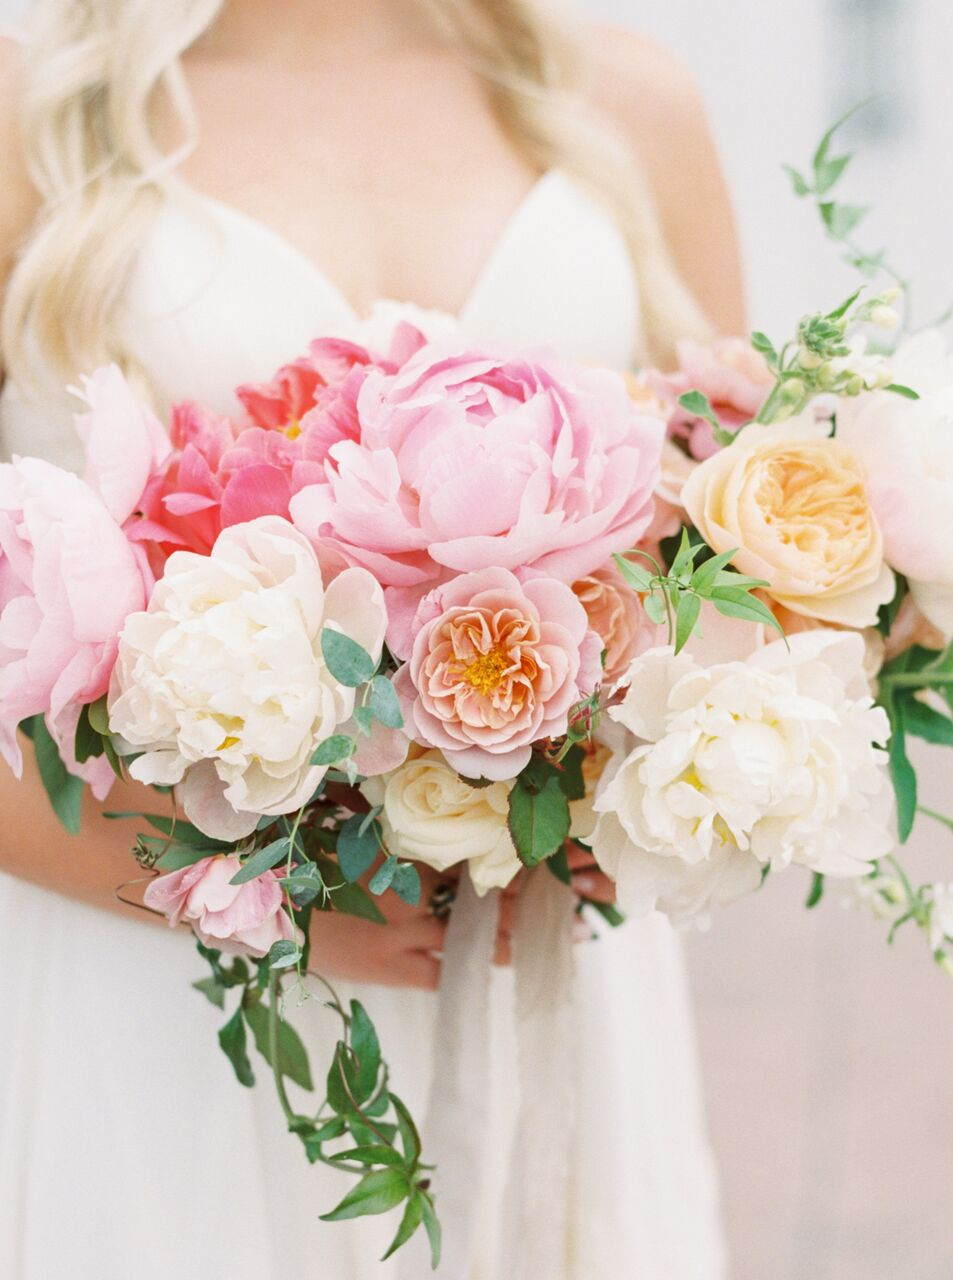 The Prettiest Pink Wedding Bouquets